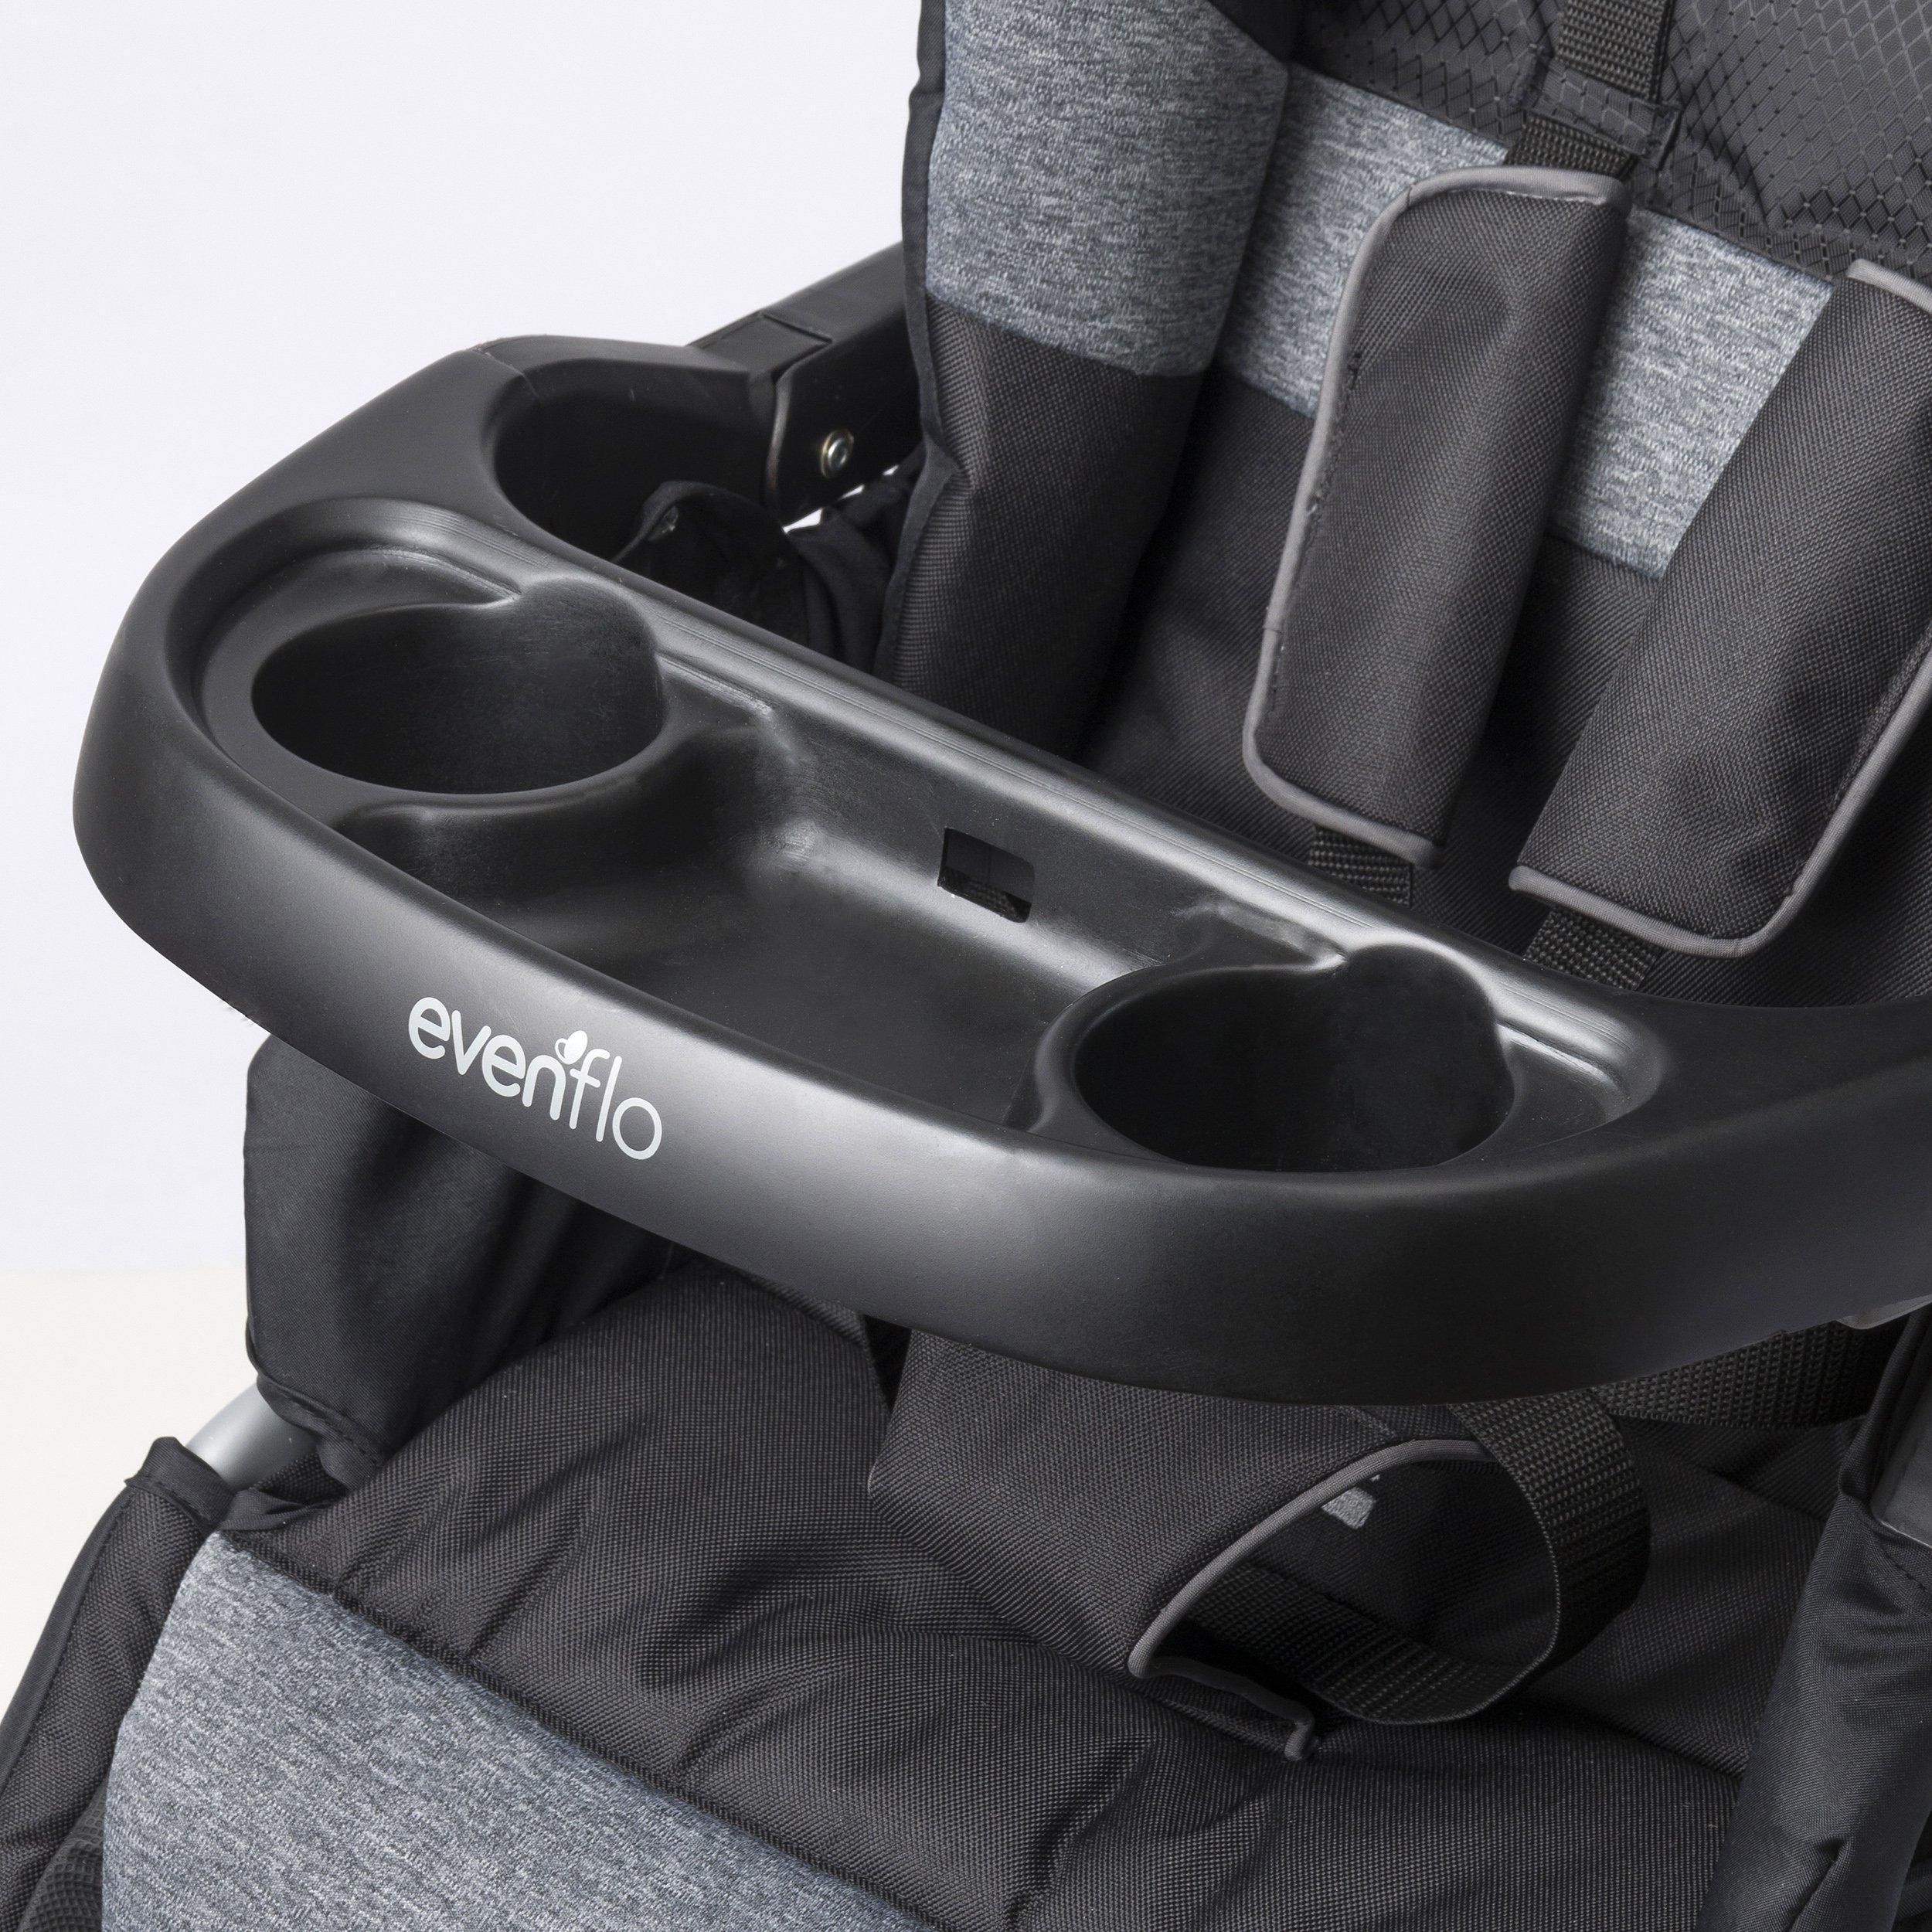 Evenflo Advanced SensorSafe Epic Travel System with LiteMax Infant Car Seat, Jet by Evenflo (Image #11)